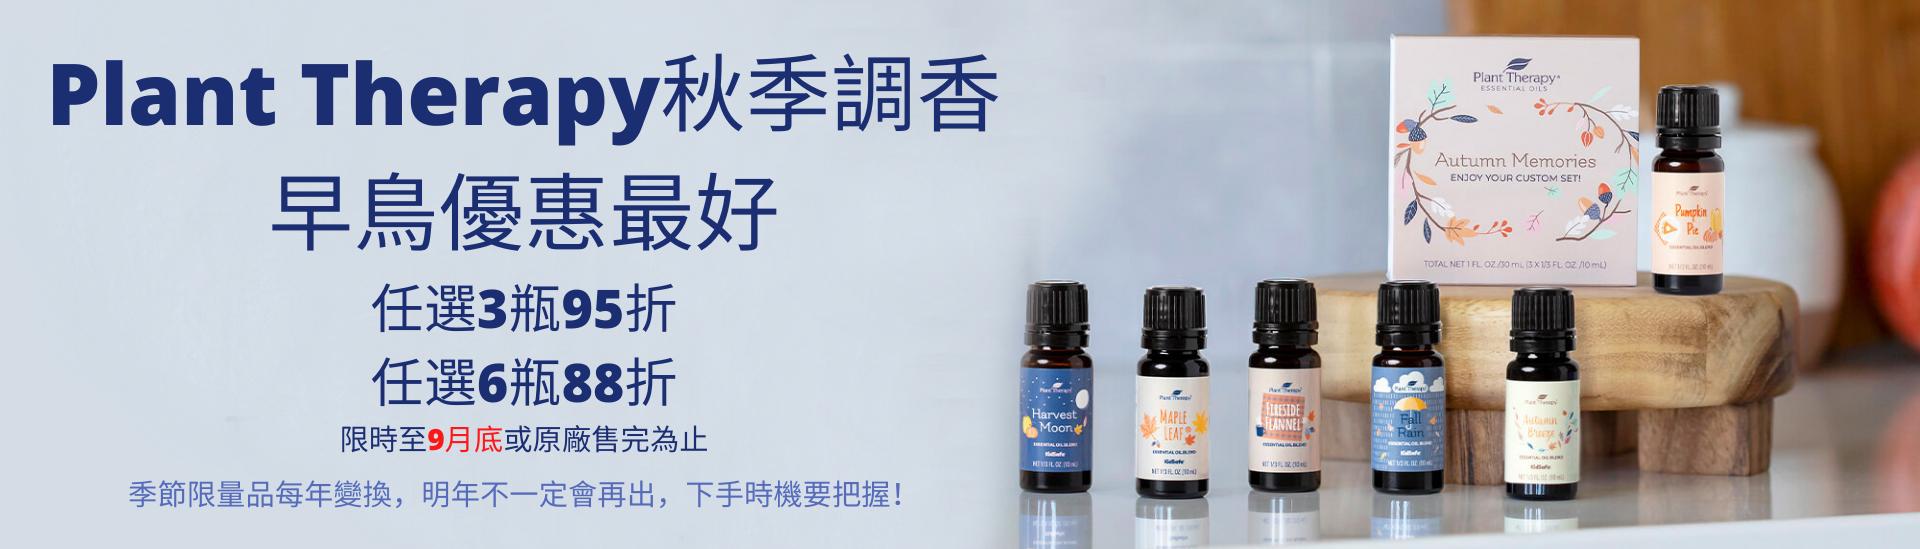 Plant thearpy 精油芳香療法-巴哈花精-巴赫花精